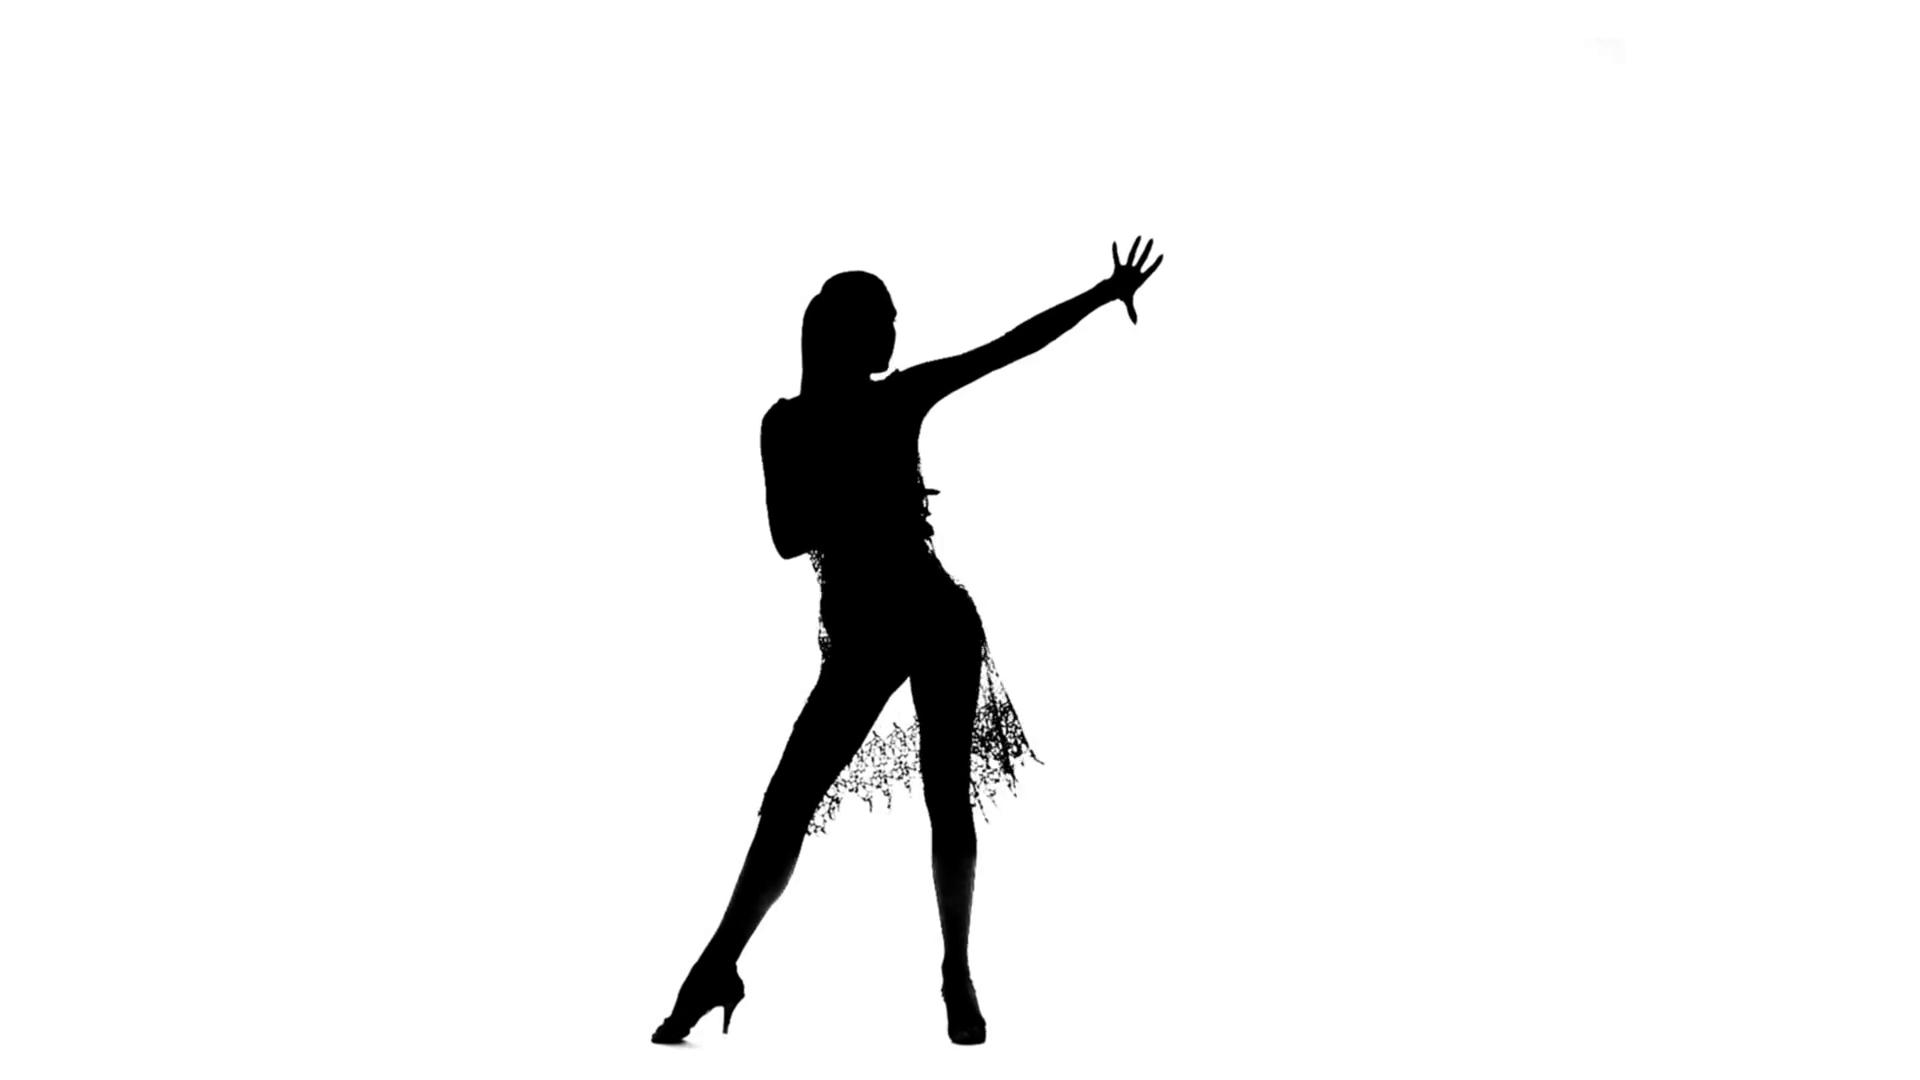 1920x1080 Solo Girl Dancing Elements Of Ballroom Dancing. Silhouette, Slow